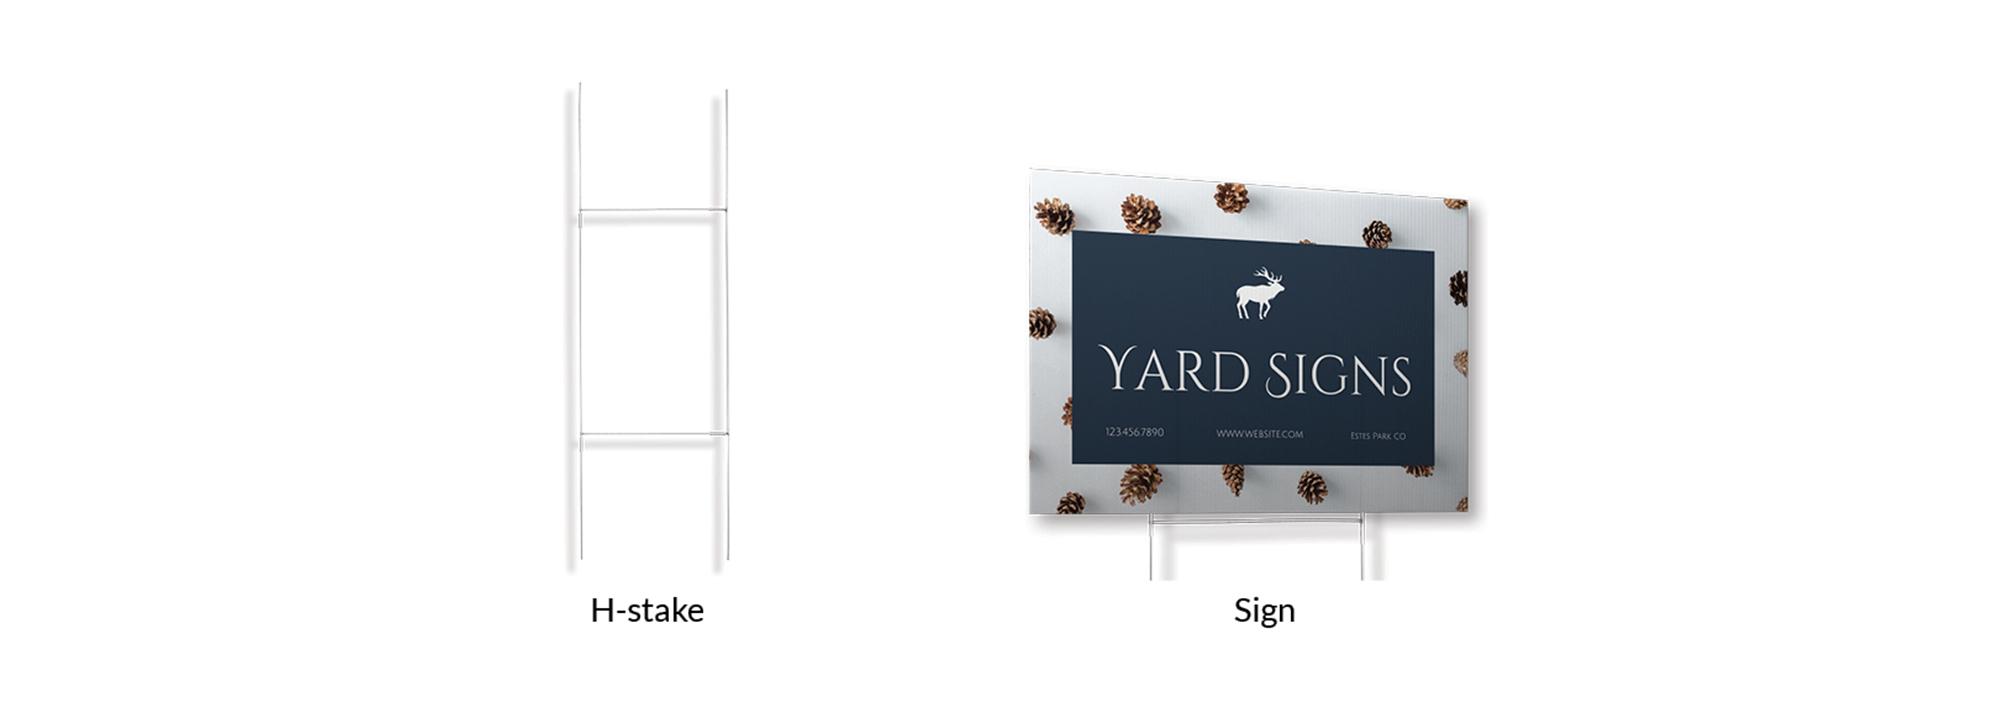 custom-yard-signs_01_r2.jpg